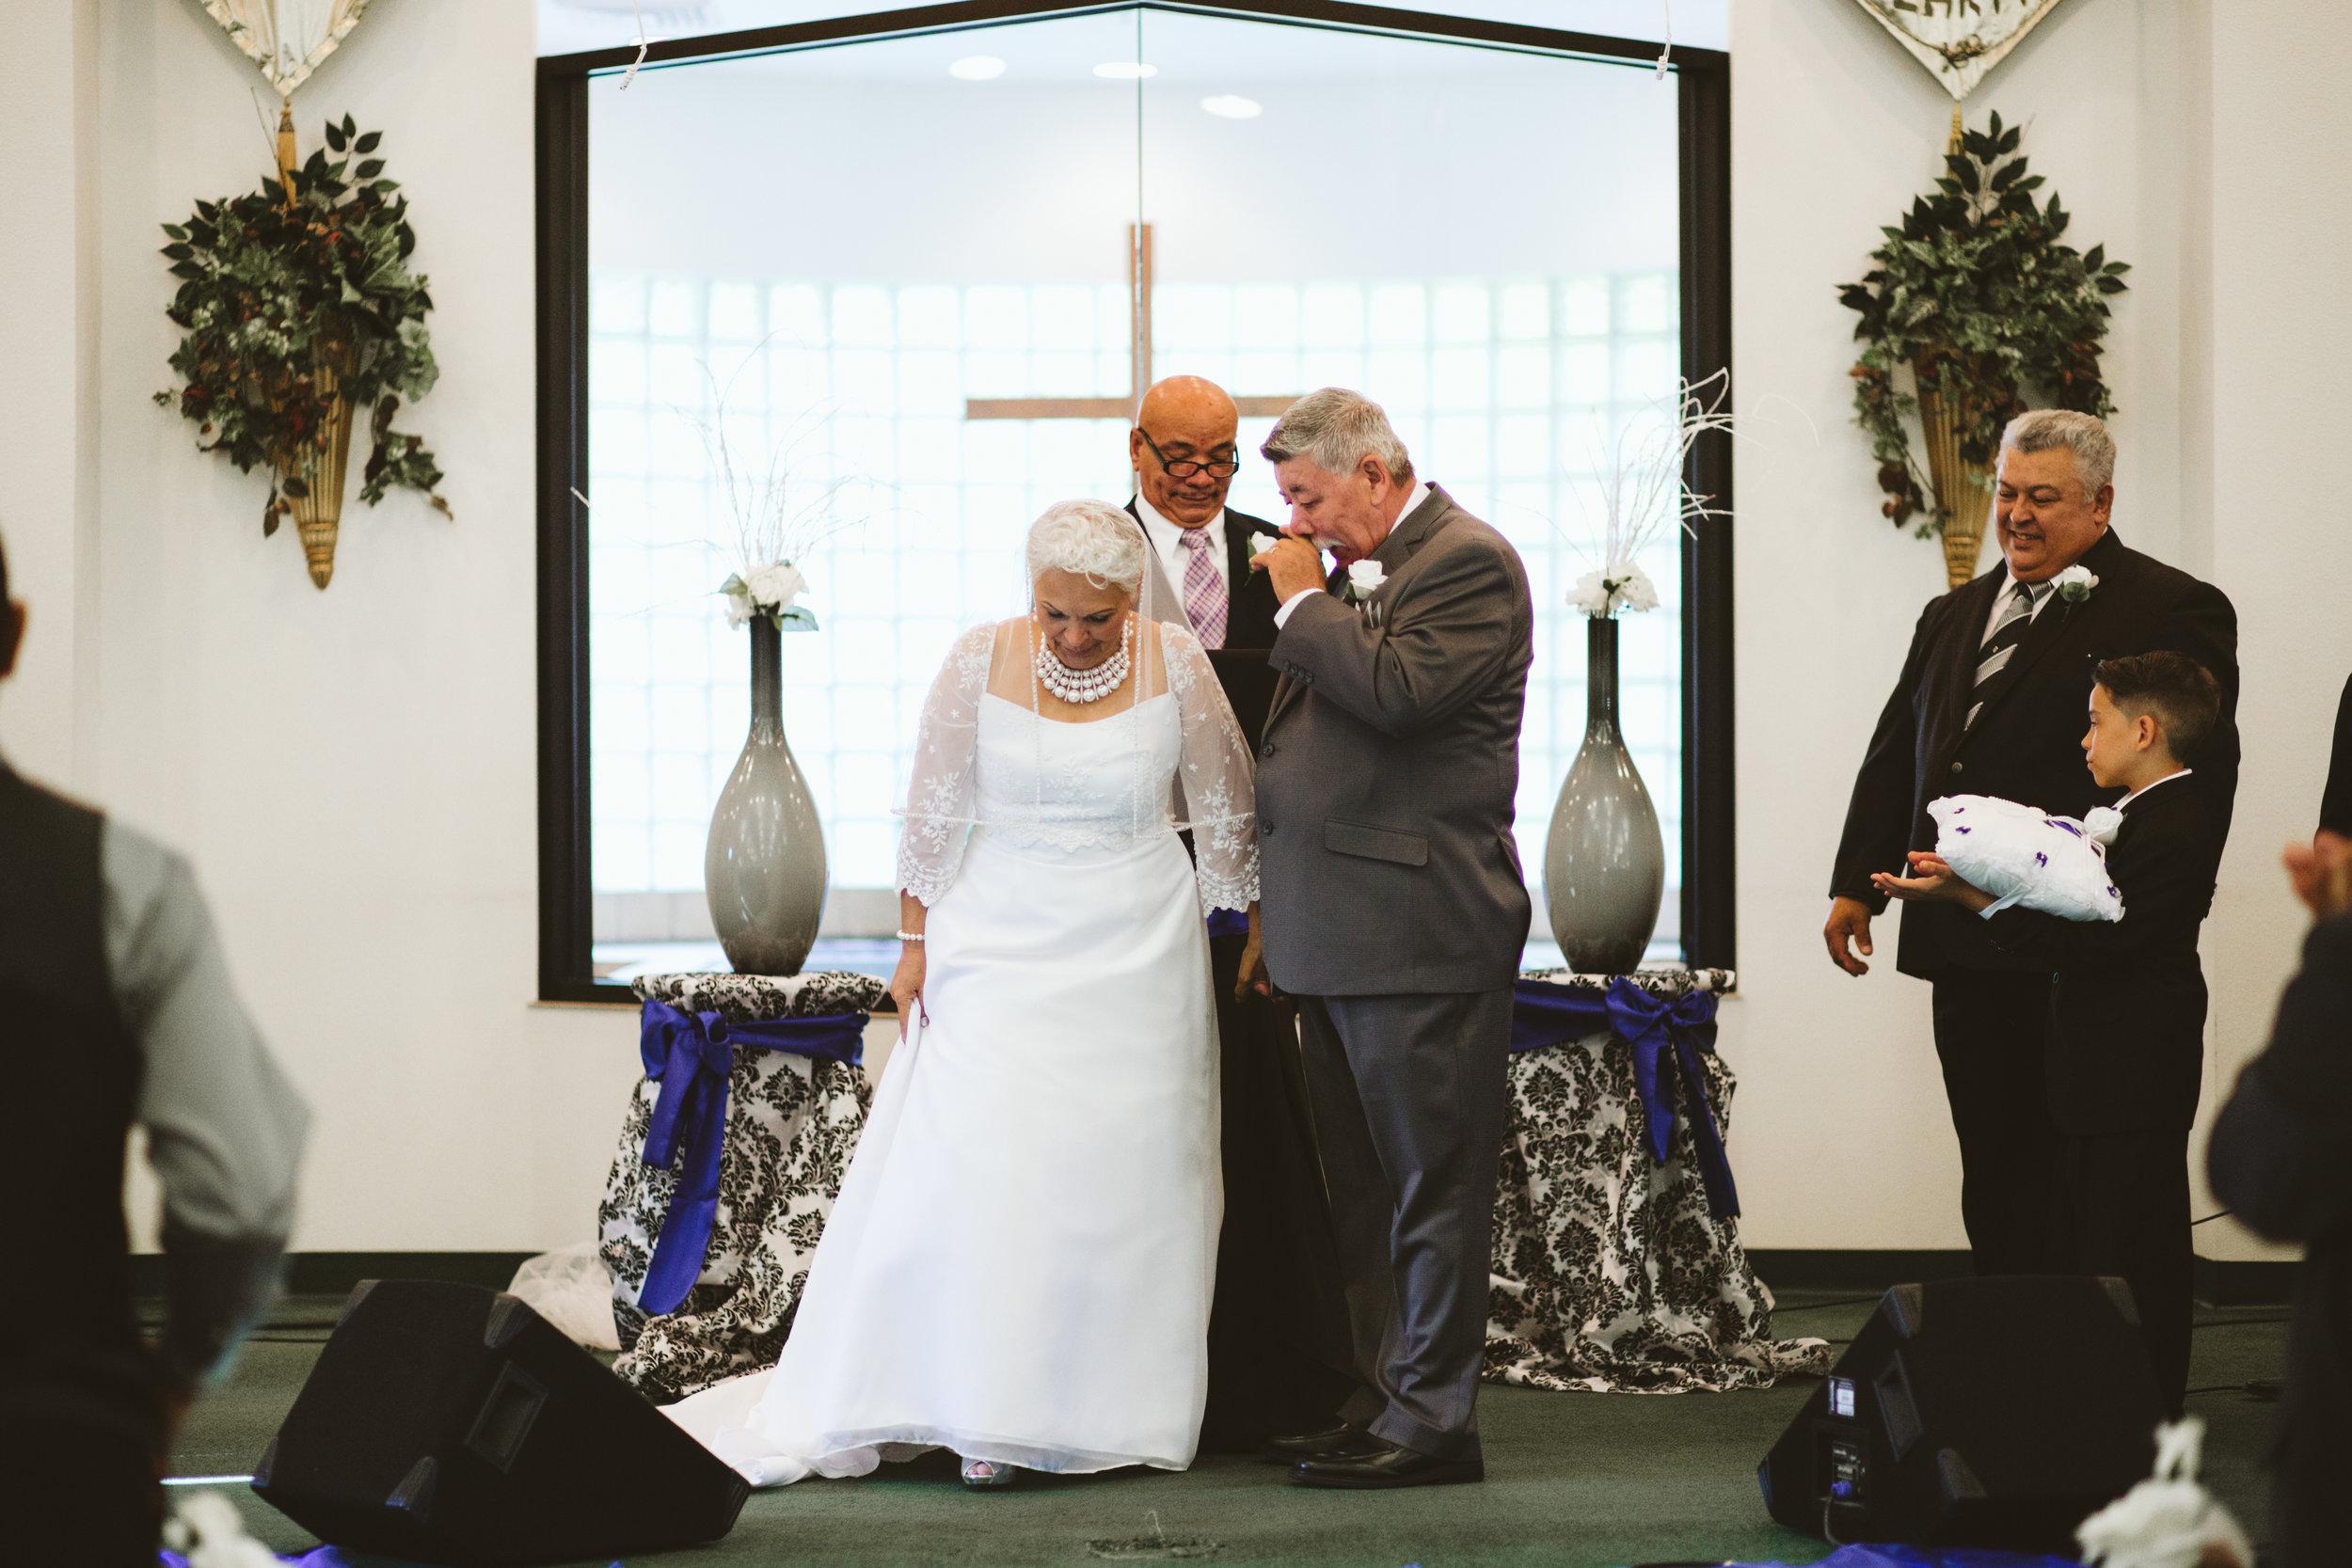 wedding | Vanessa Boy Photography | vanessaboy.com |-160.jpg